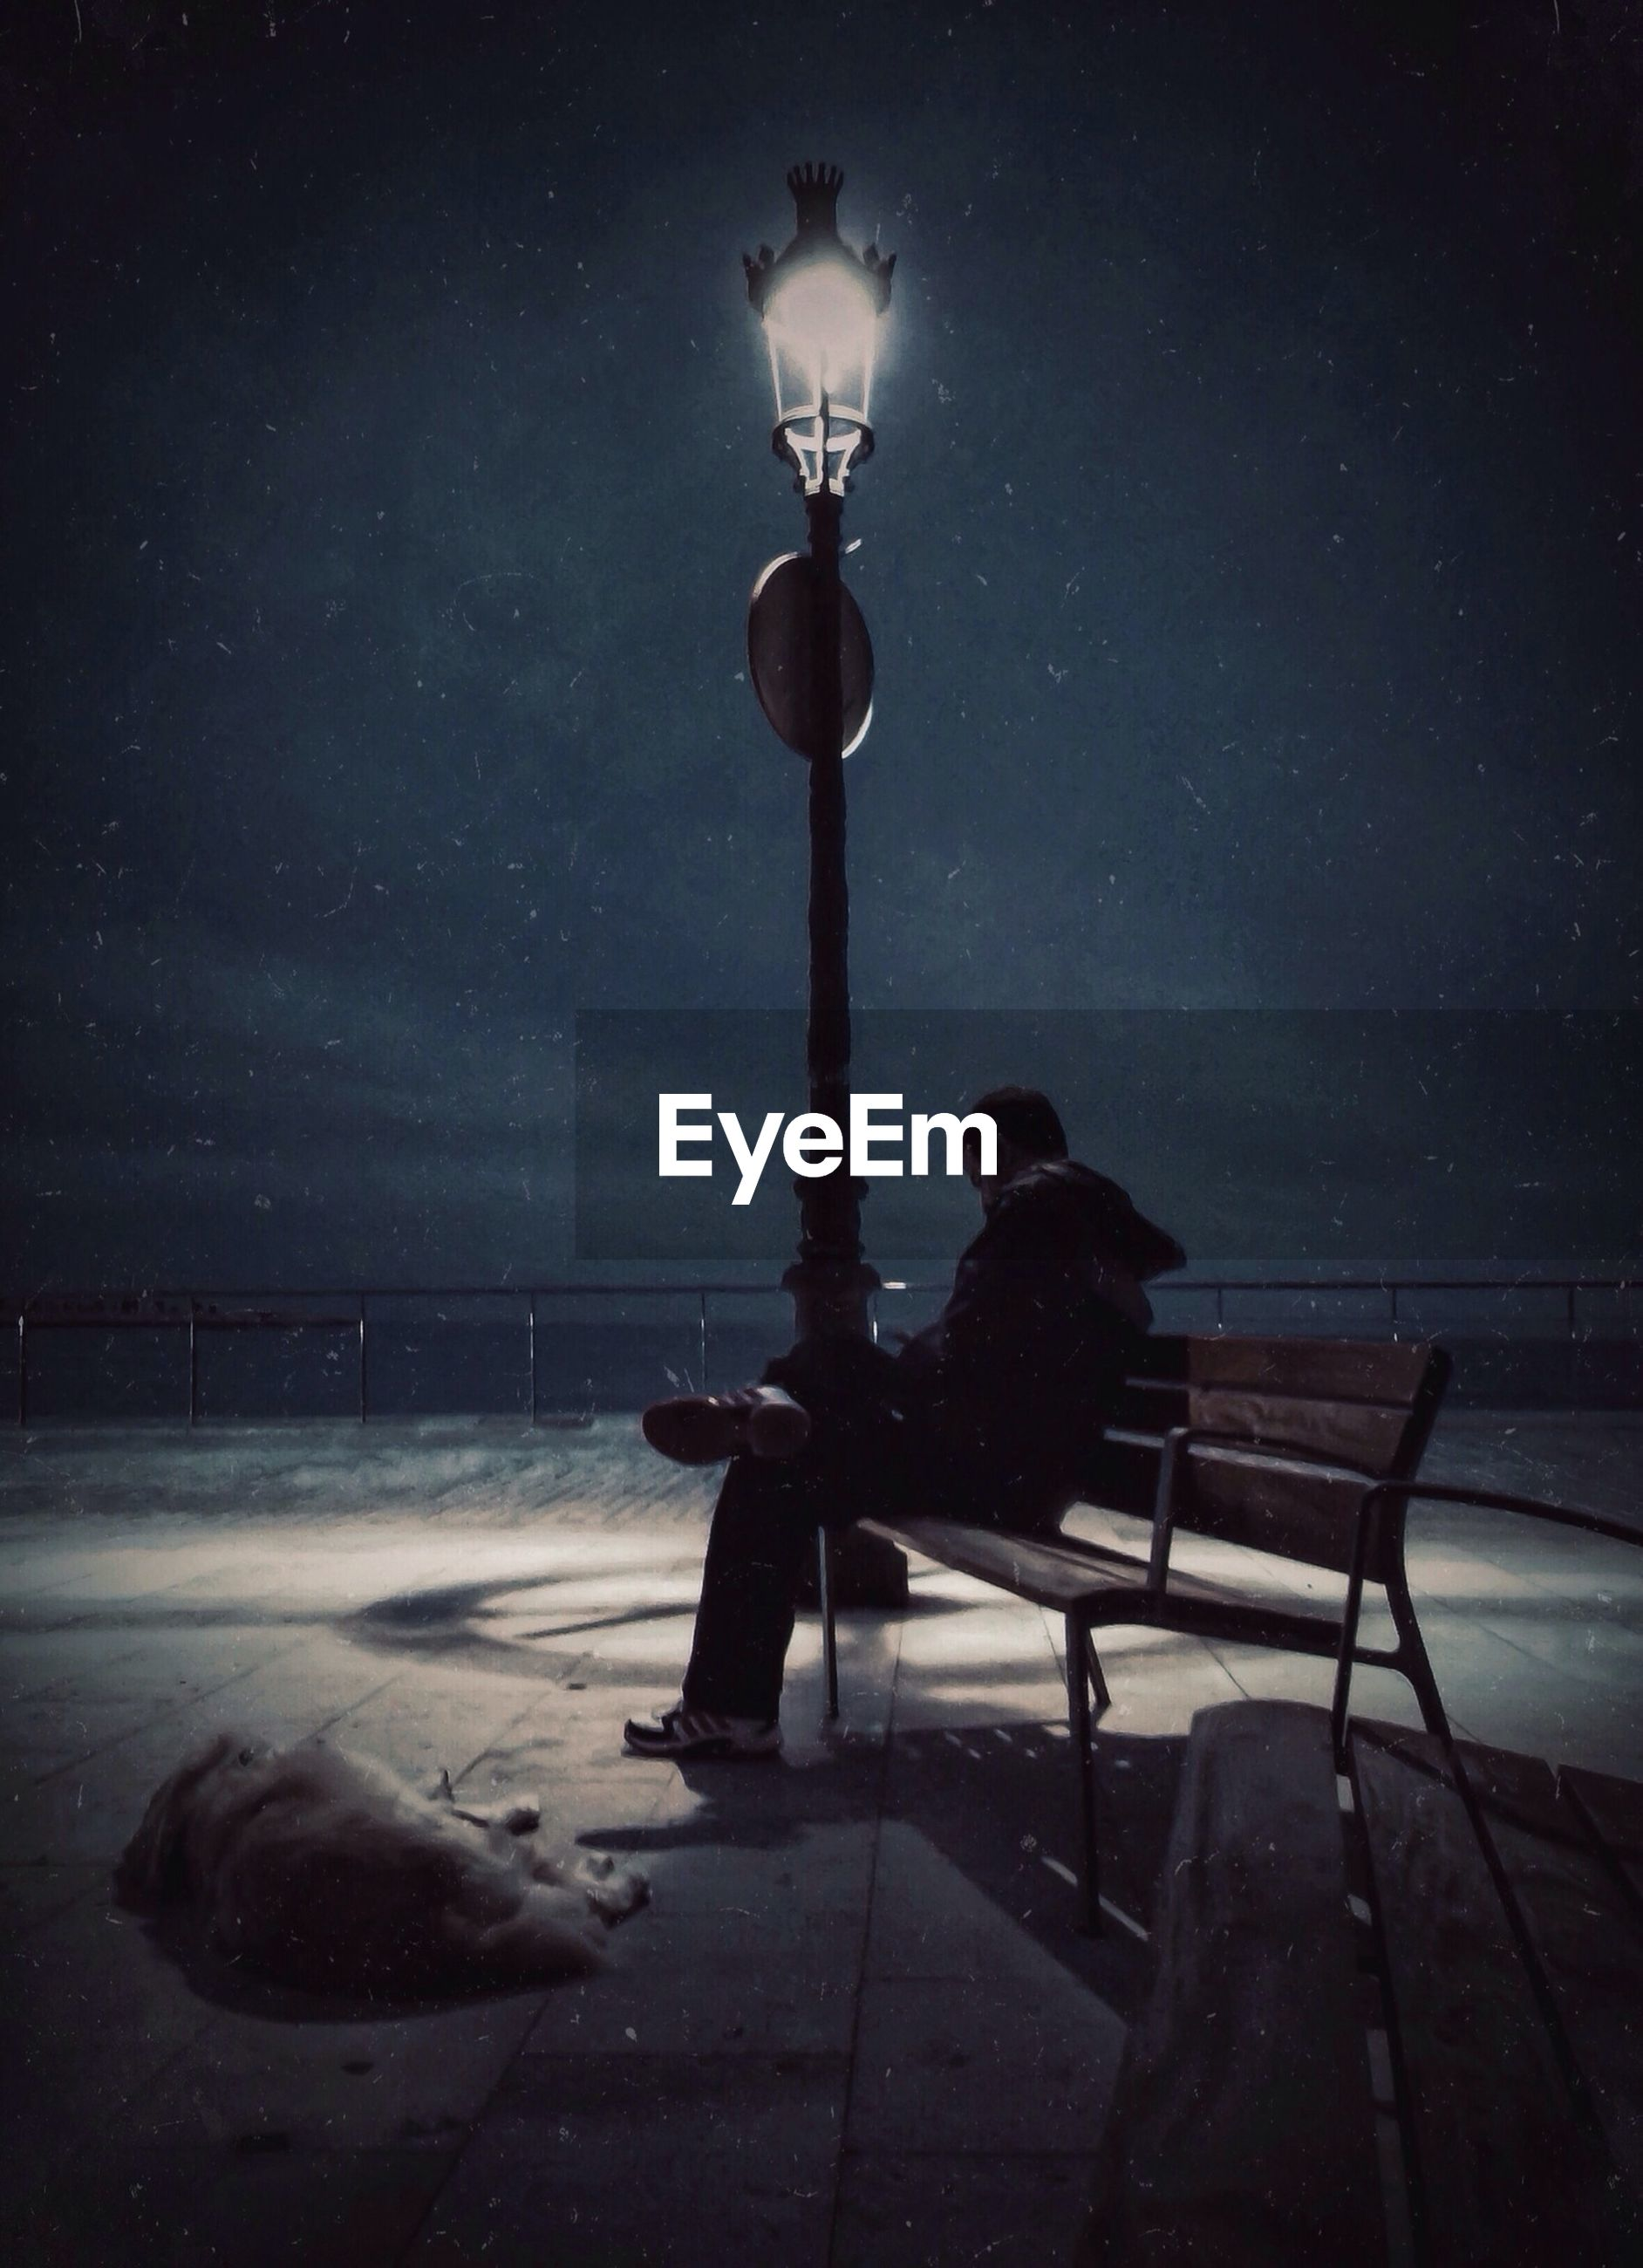 Man sitting on park bench at night